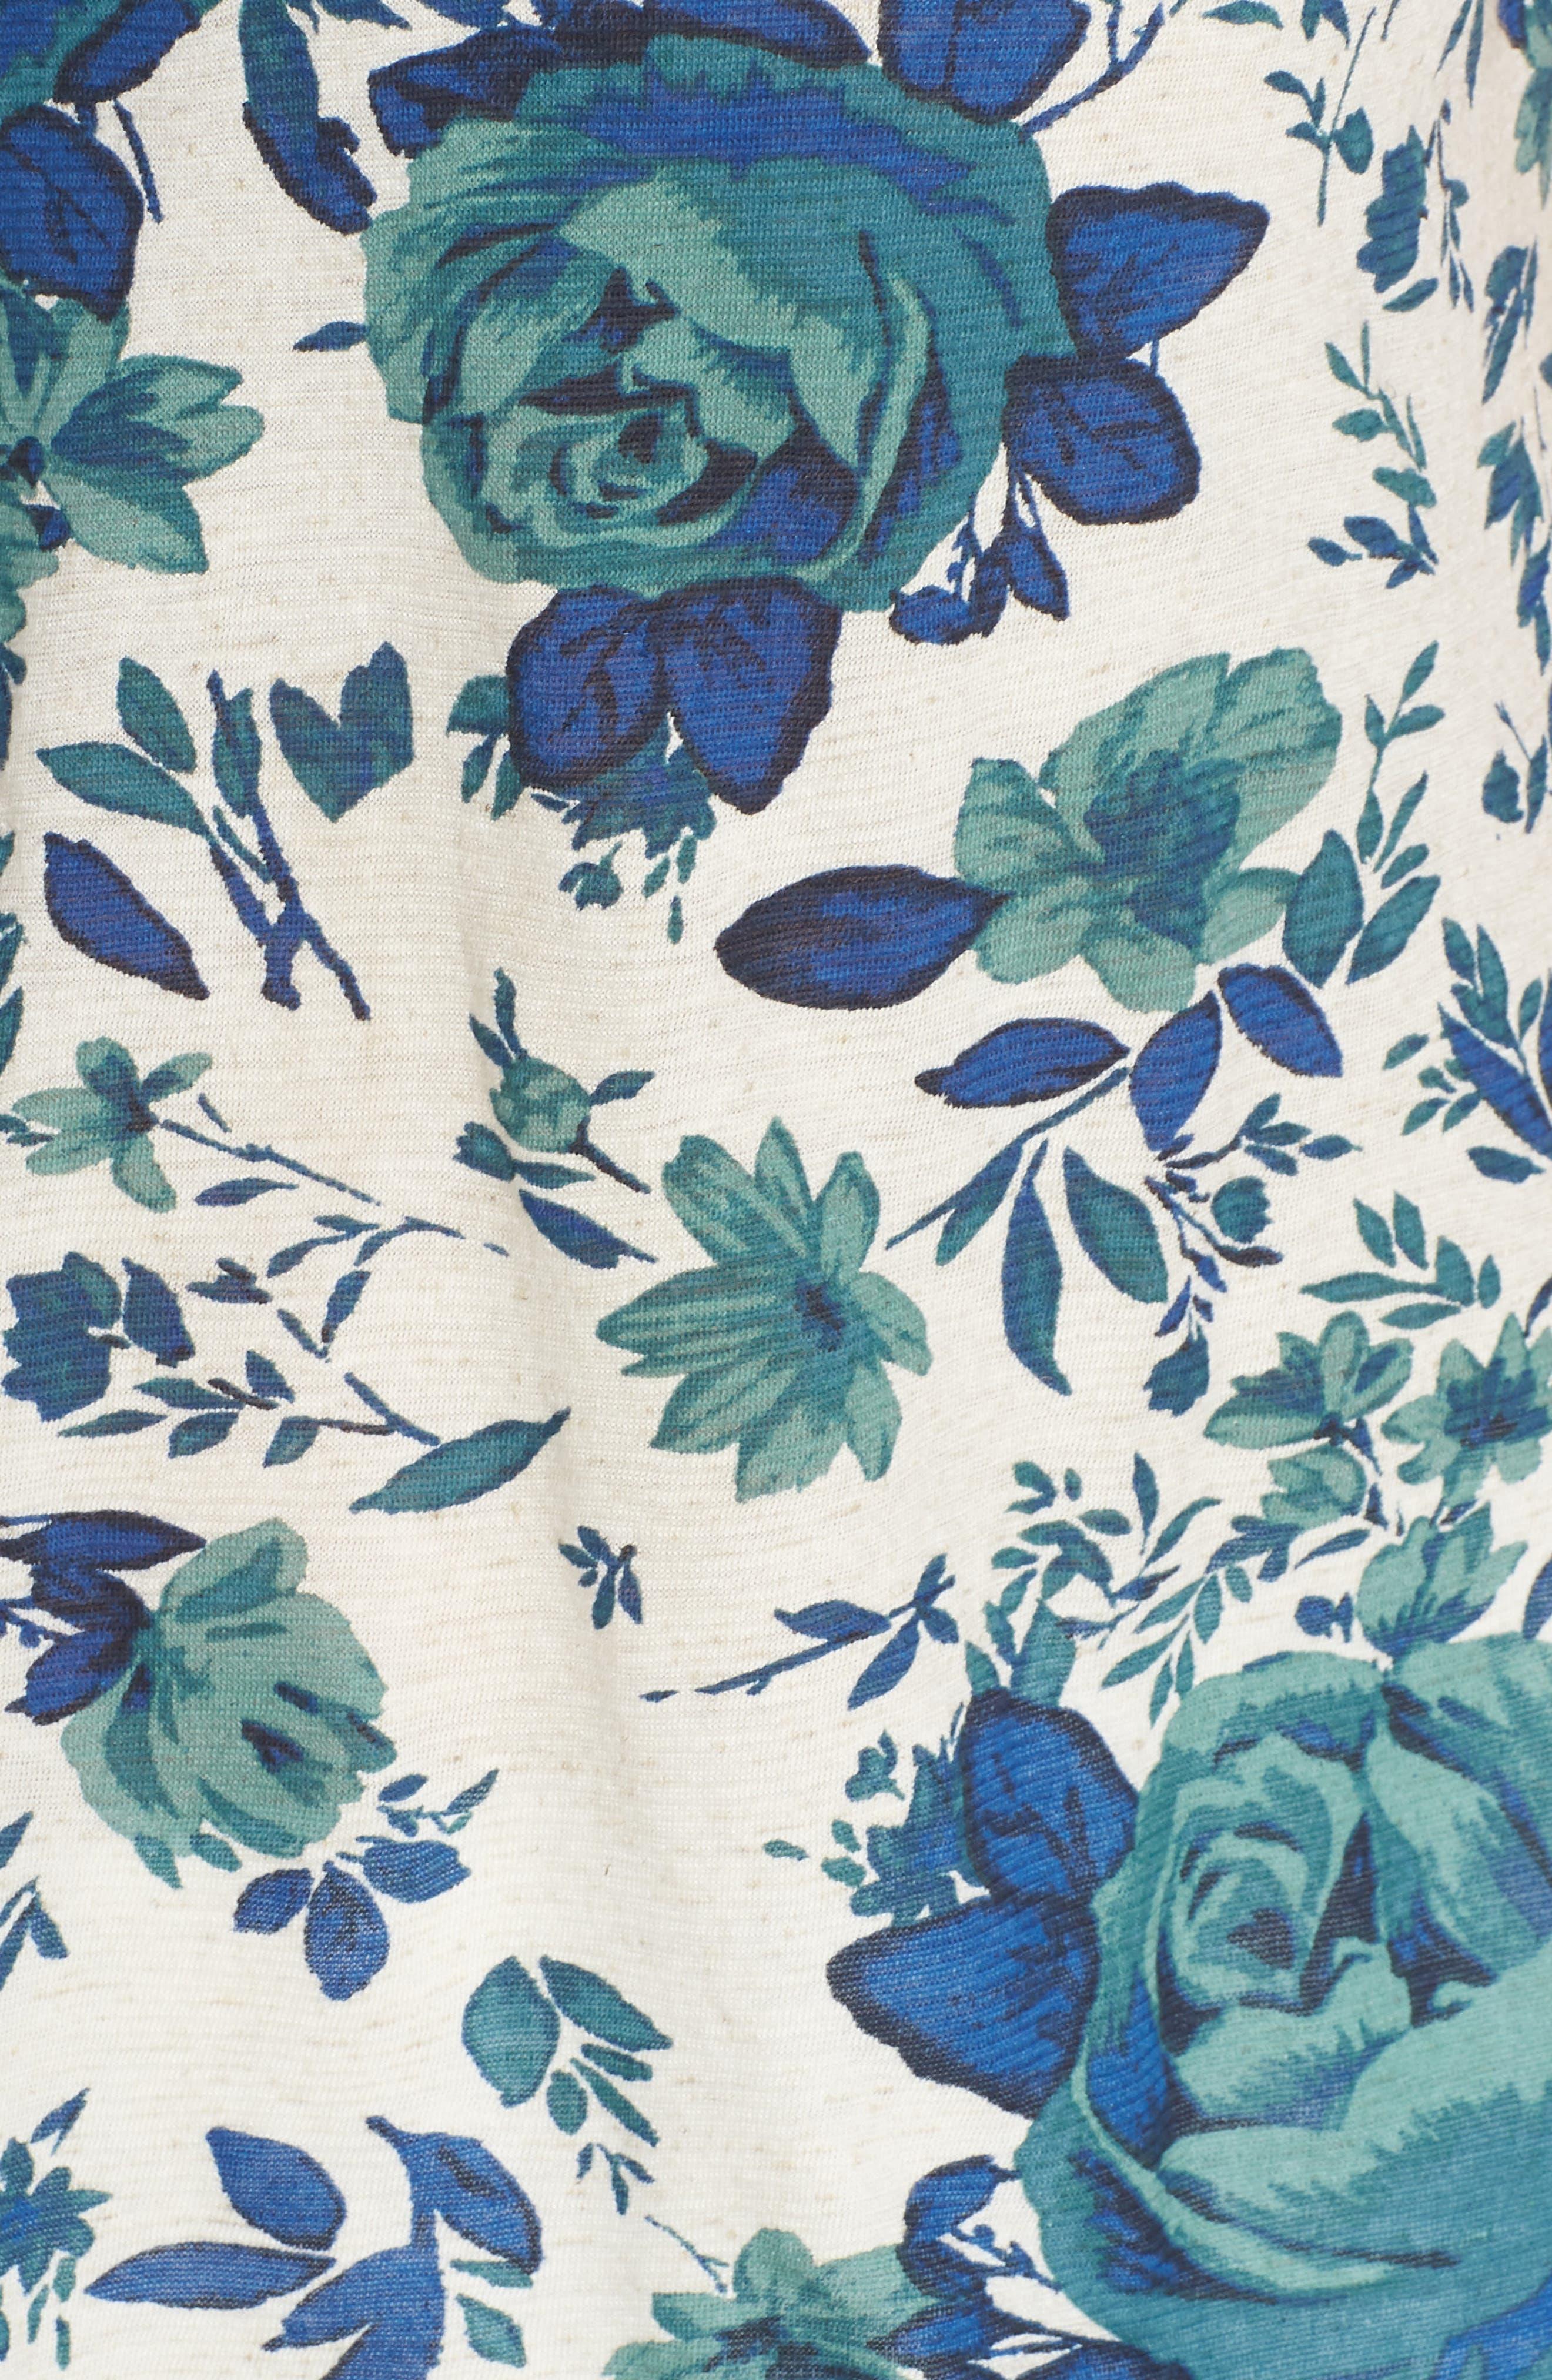 Floral Tank,                             Alternate thumbnail 6, color,                             Blue Multi